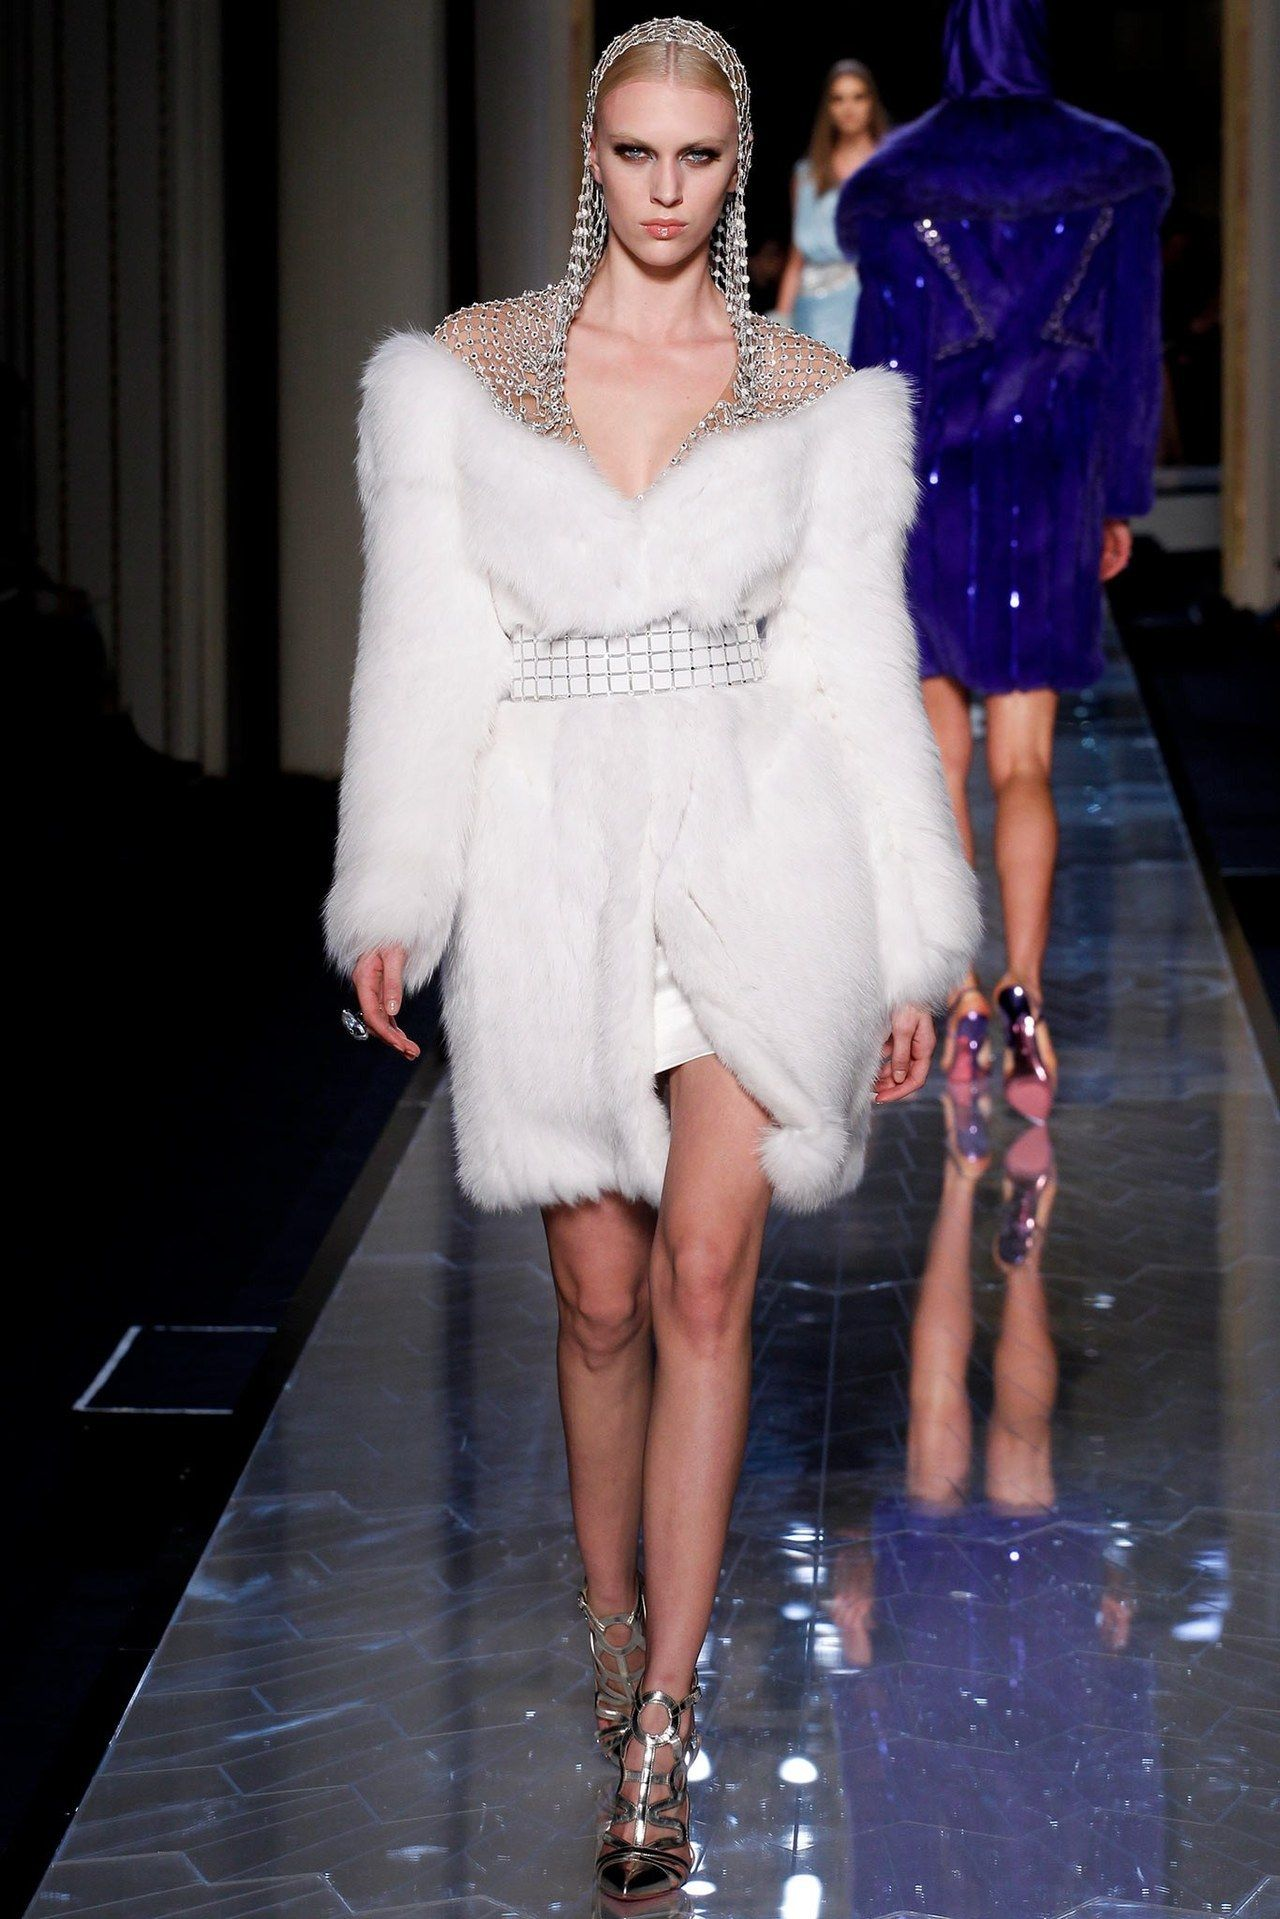 Atelier VersaceSpring14 Couture - #2014 #atelier #catwalk #Couture #Fashion #für #High #RTW #Runway #Style #Versace #White